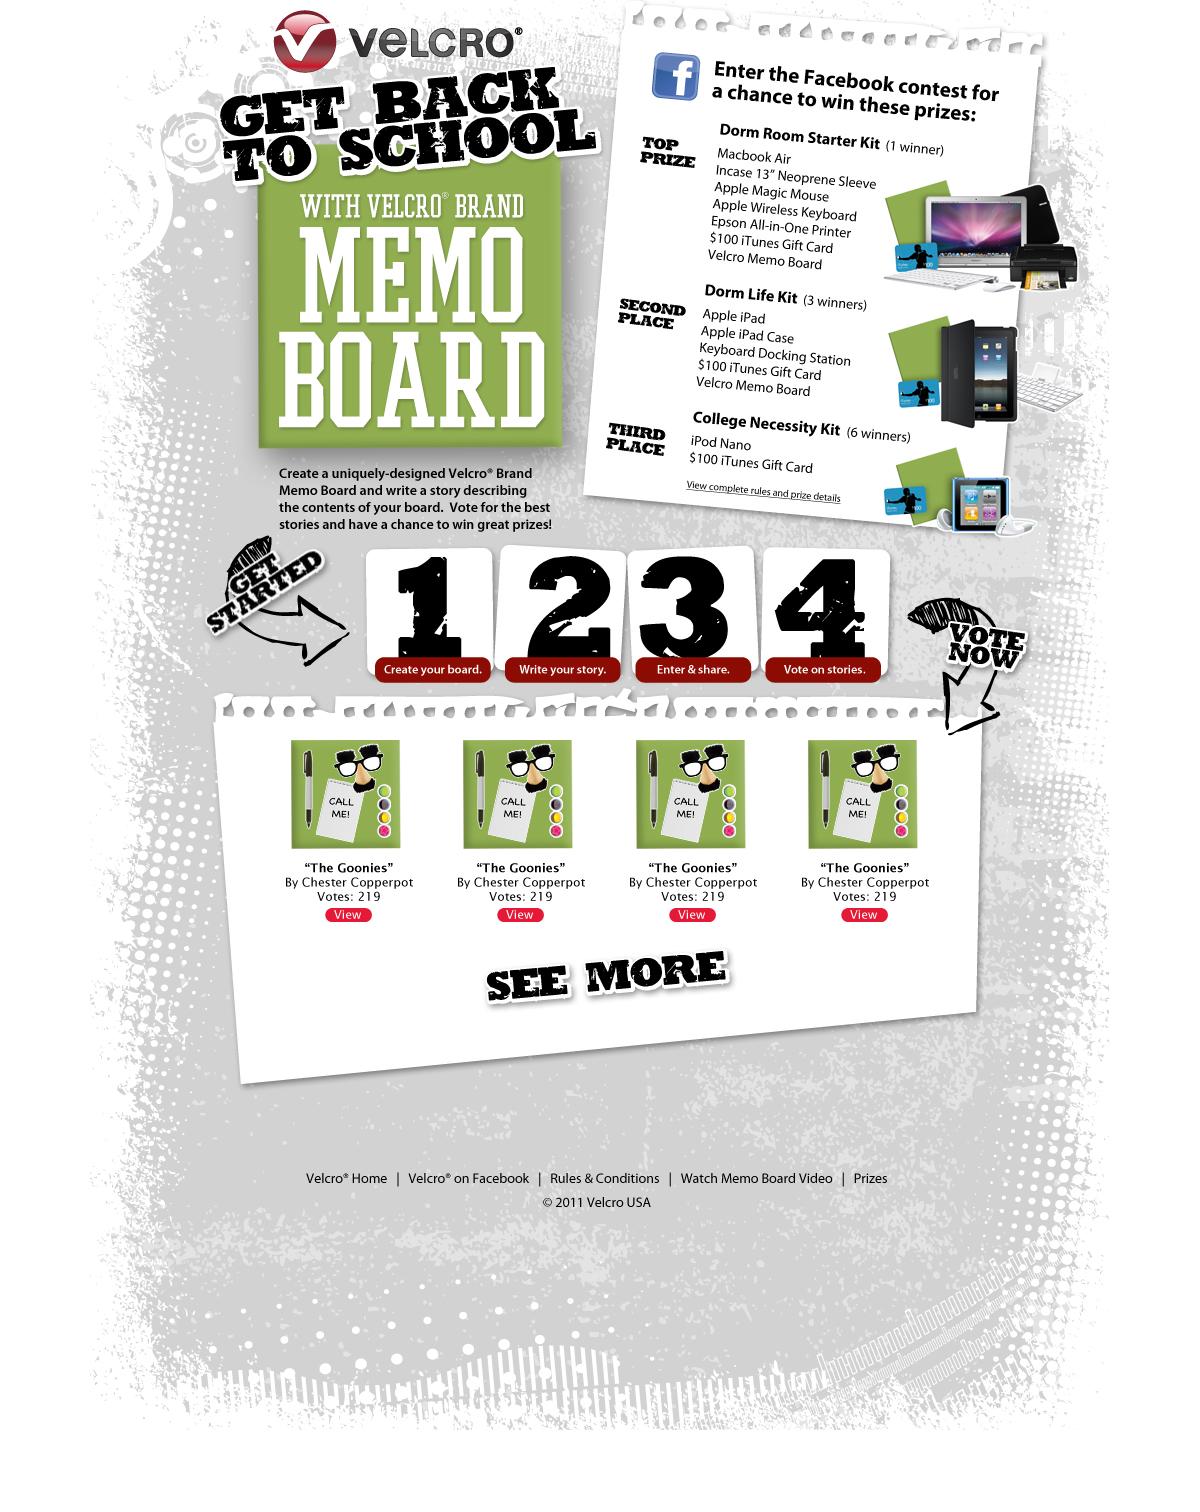 VELCRO® brand fasteners - GY&K on behalf of Velcro USA Inc